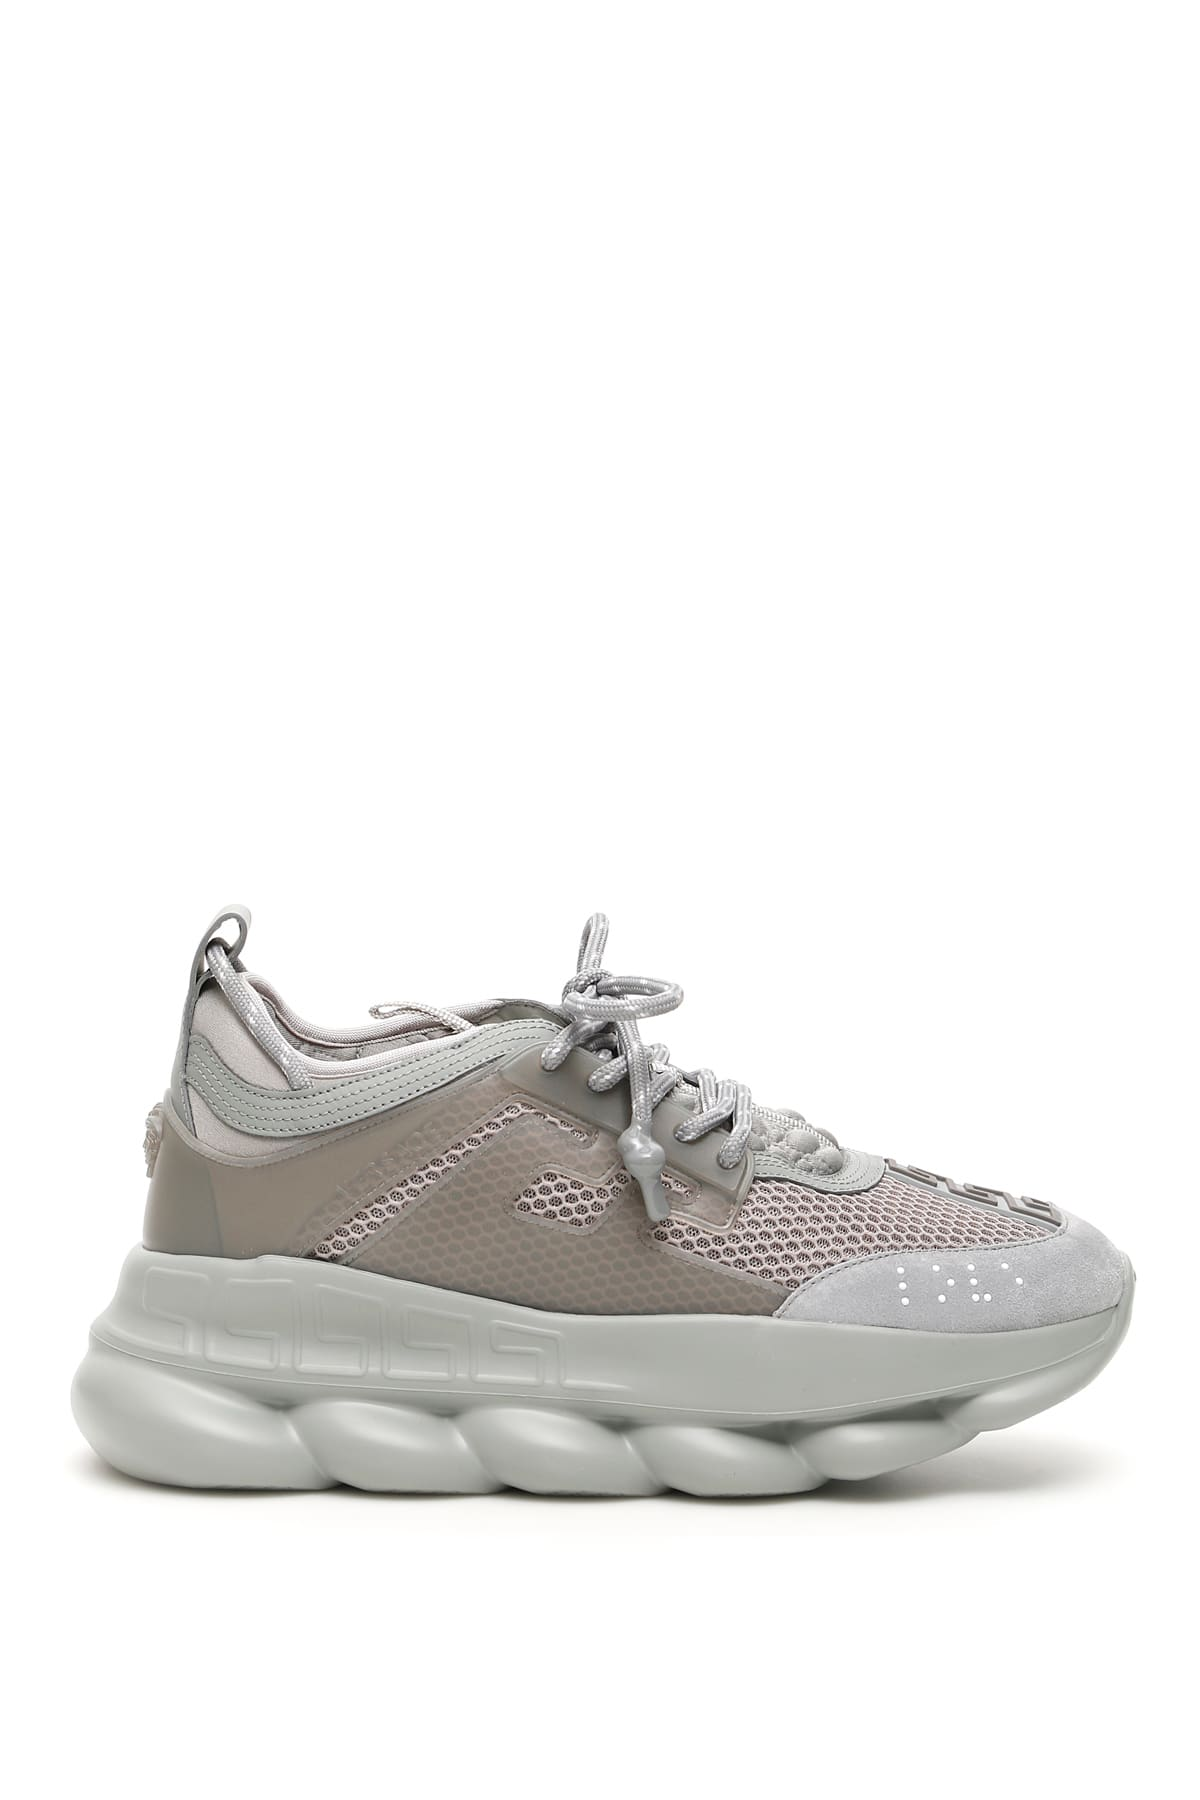 versace chain reaction grey